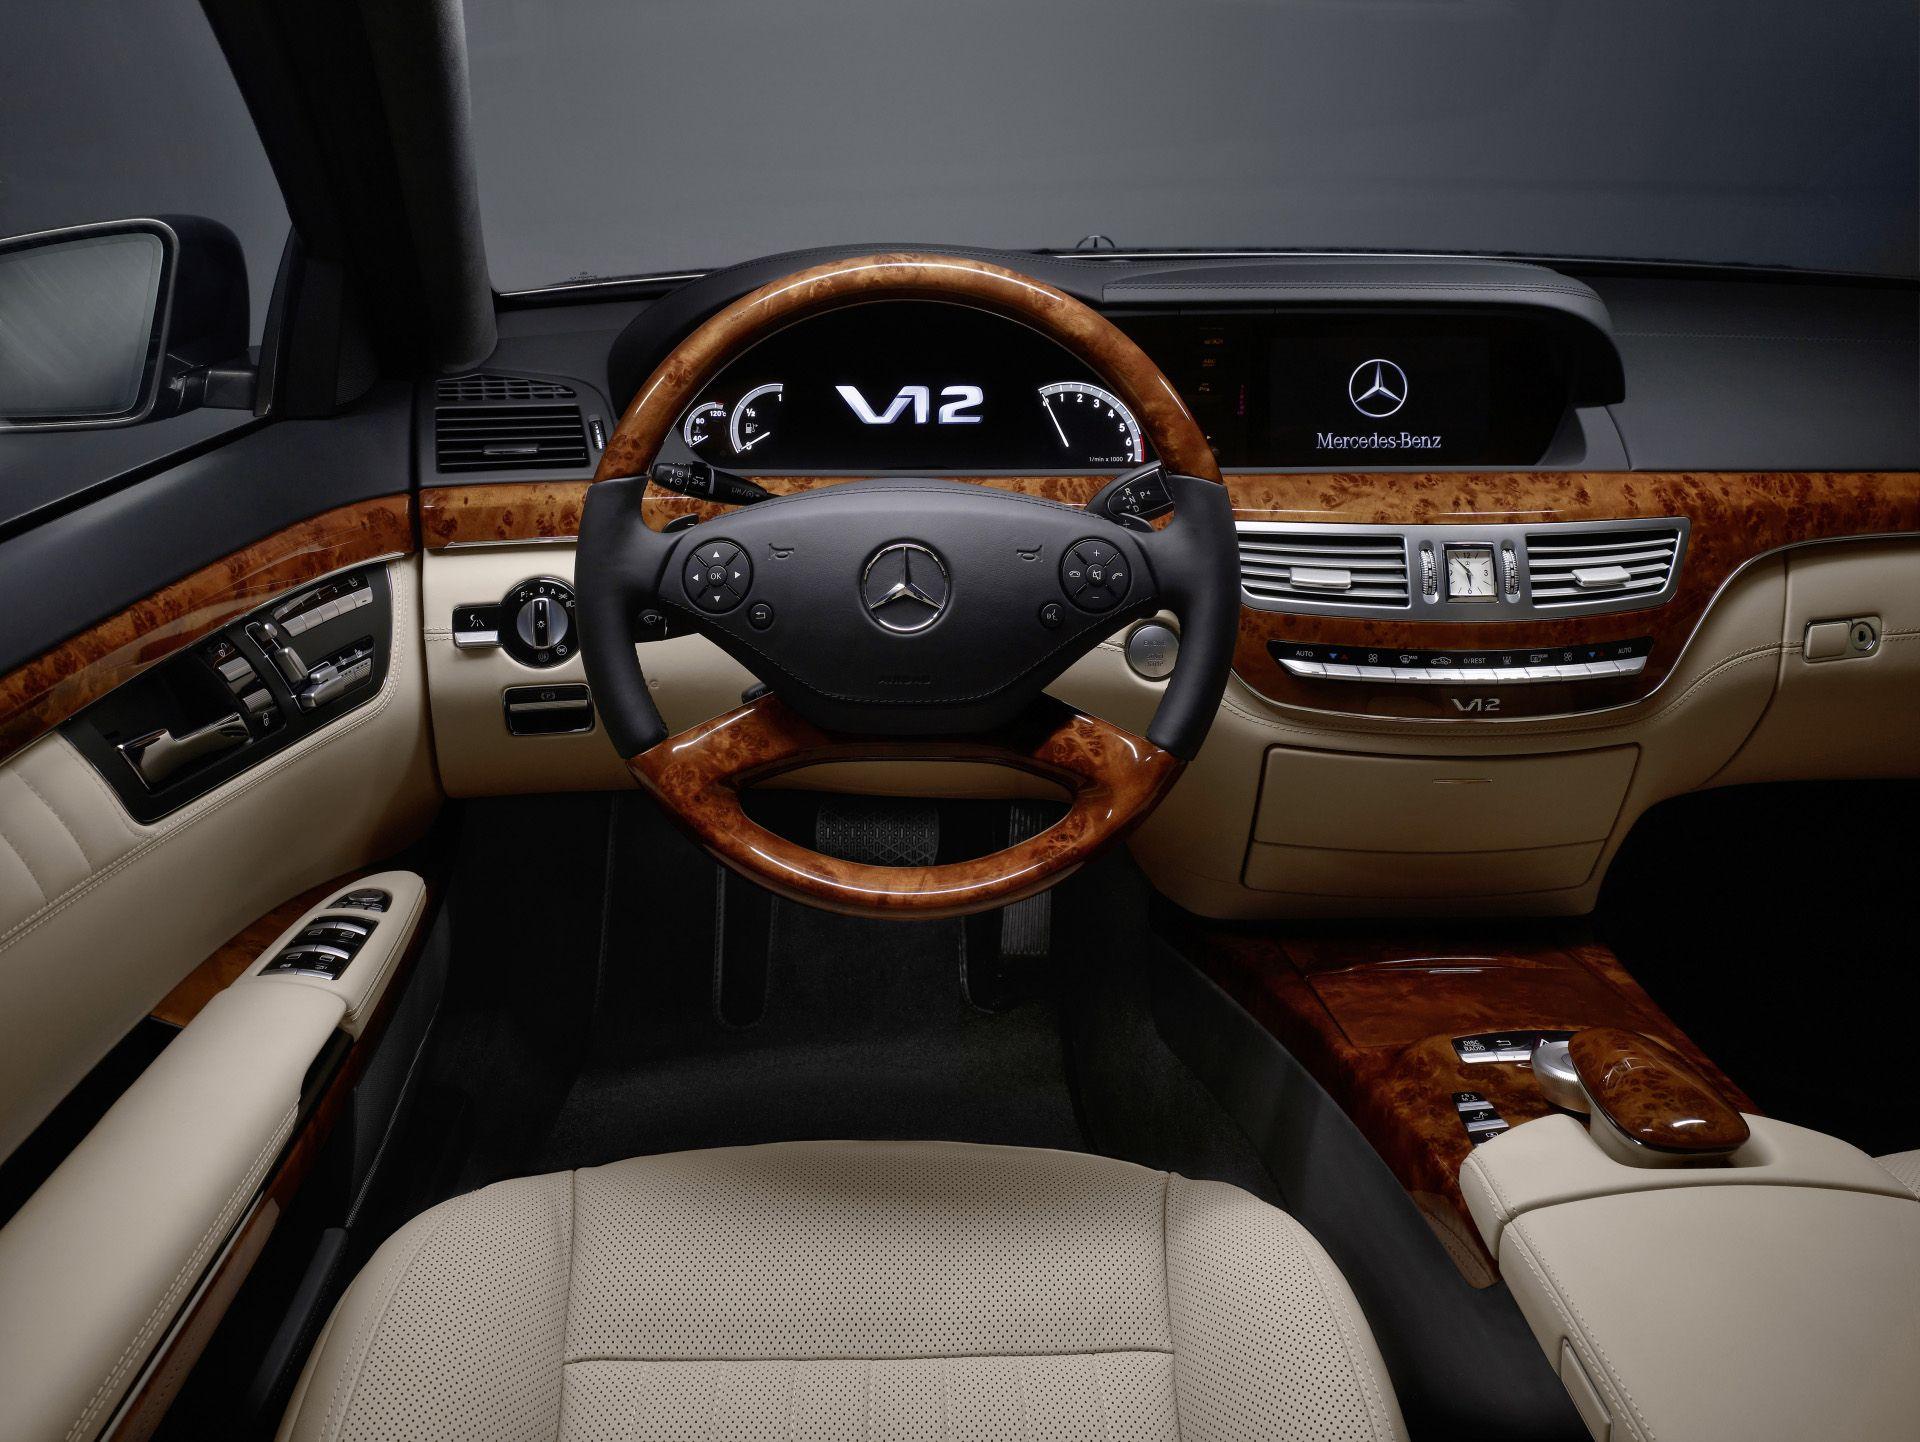 Mercedes Benz V12 S Class